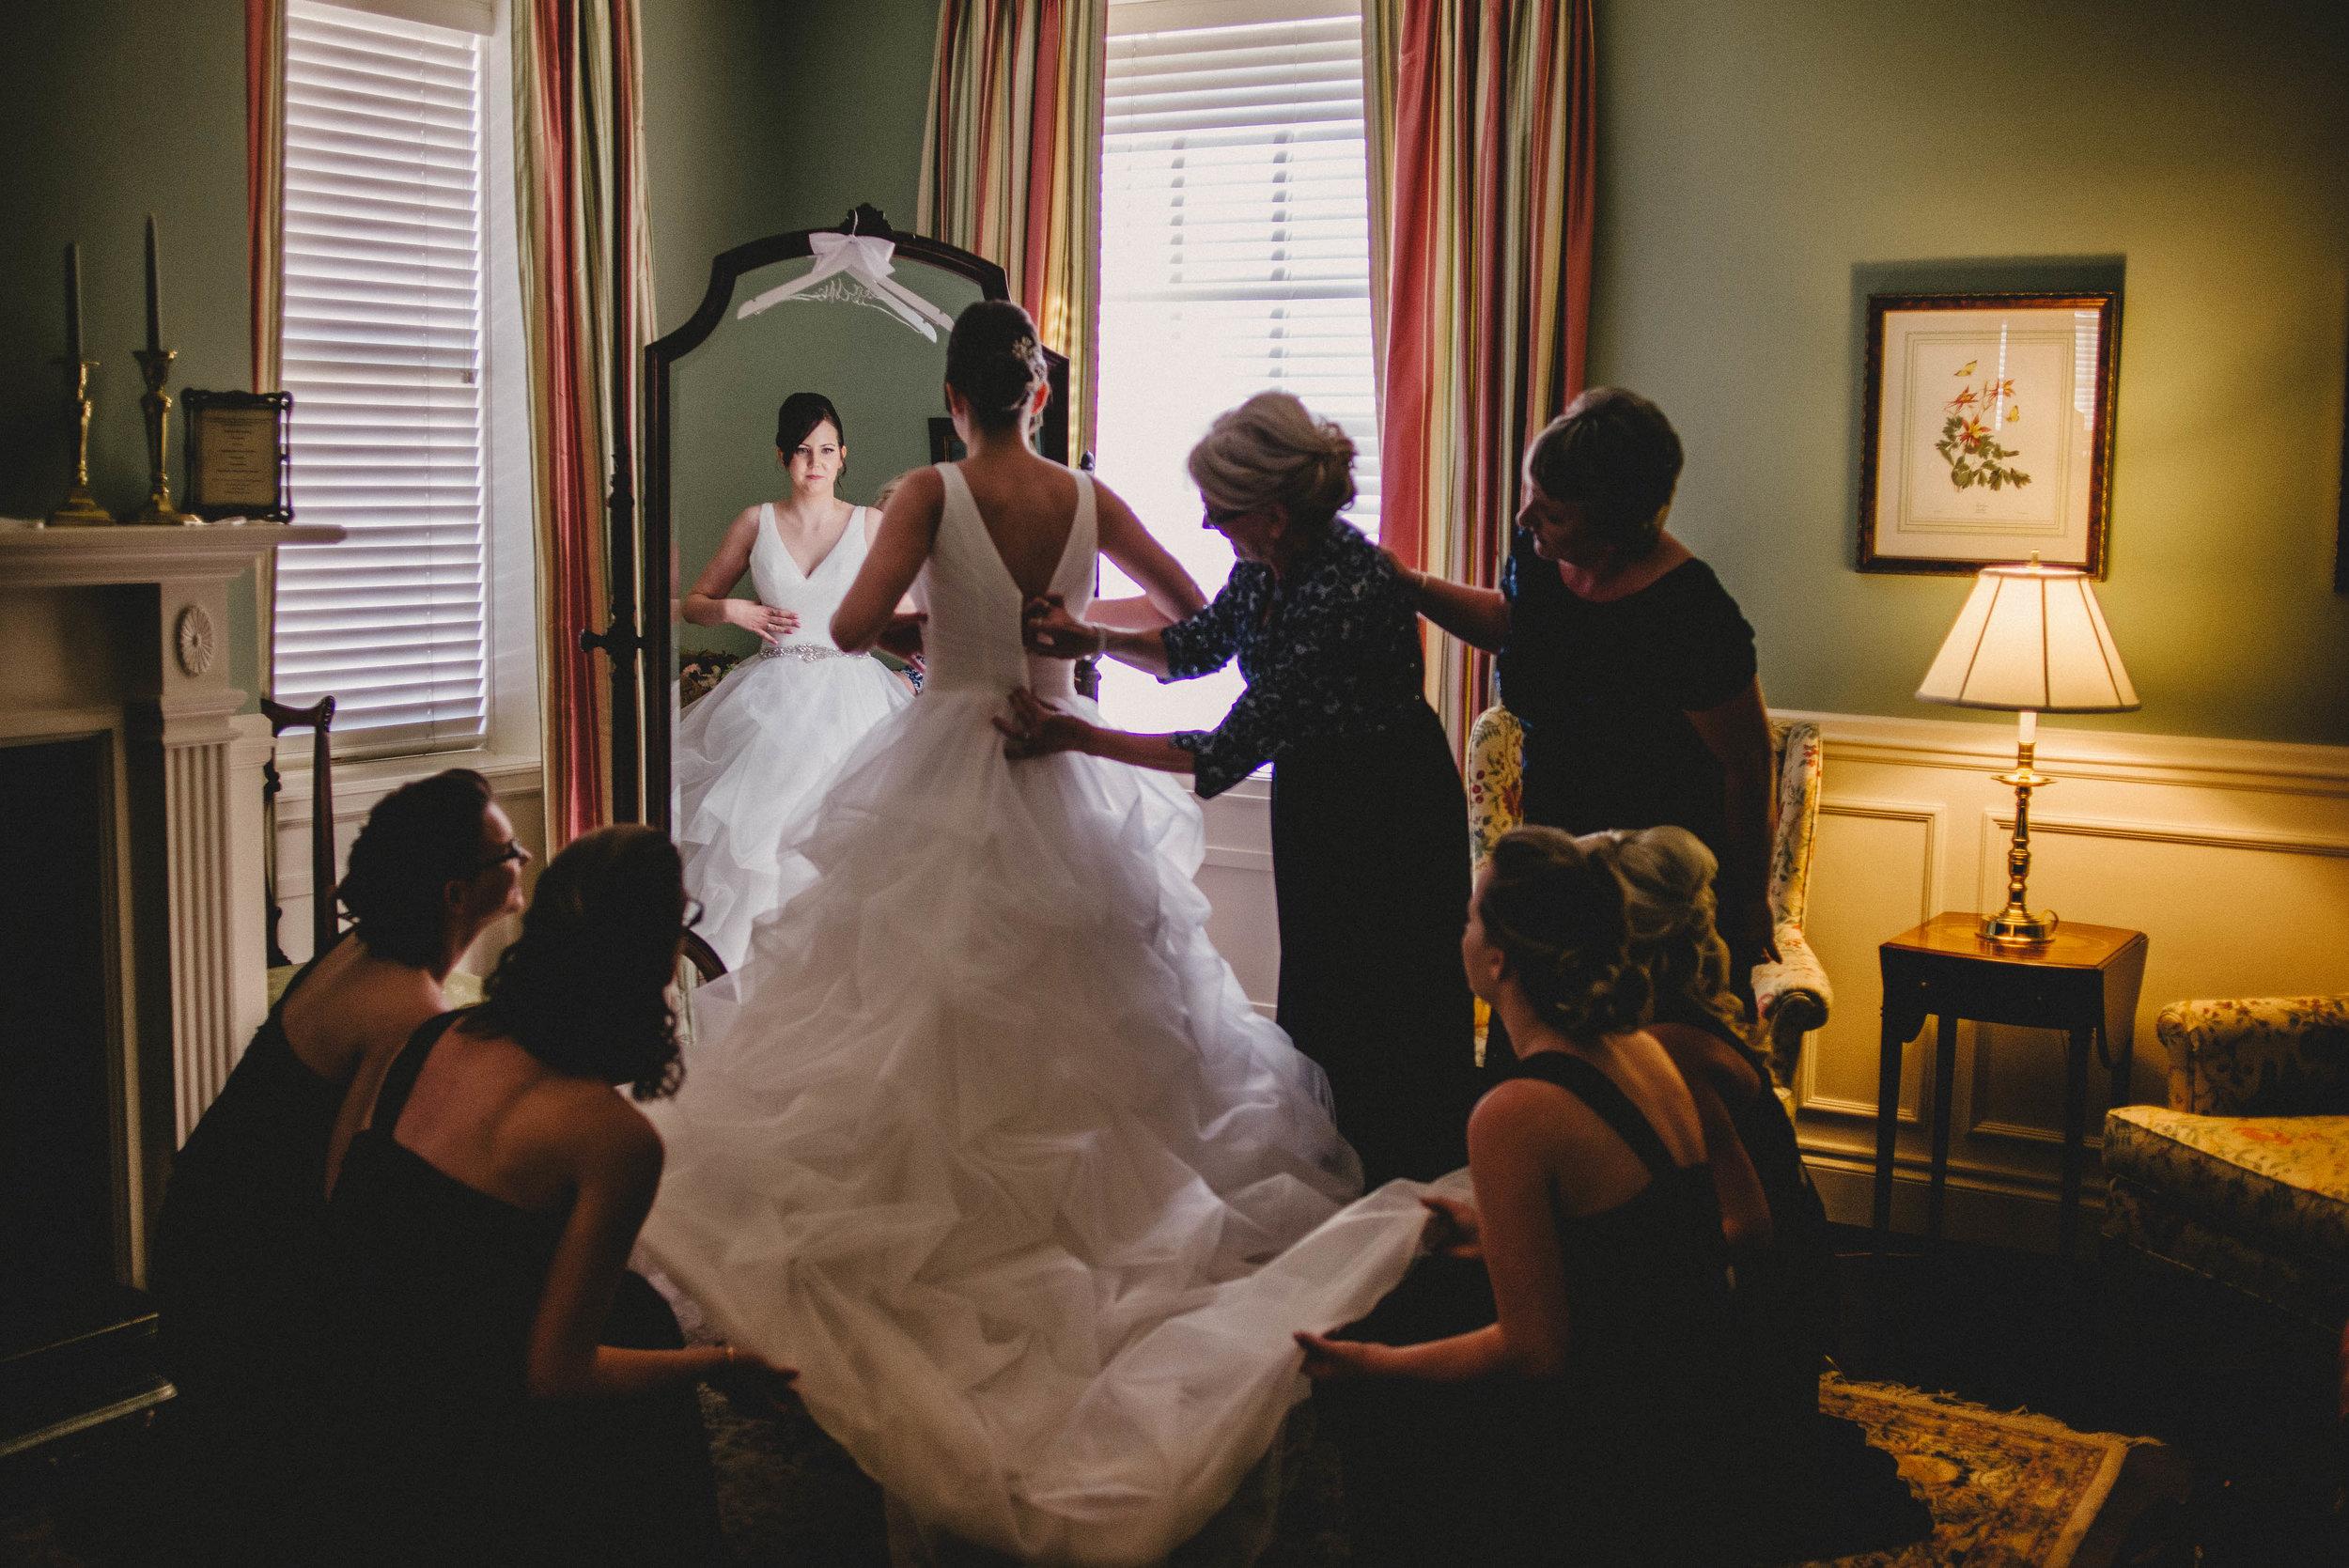 Kara and Mike Wedding-20160904-13-56-21.jpg